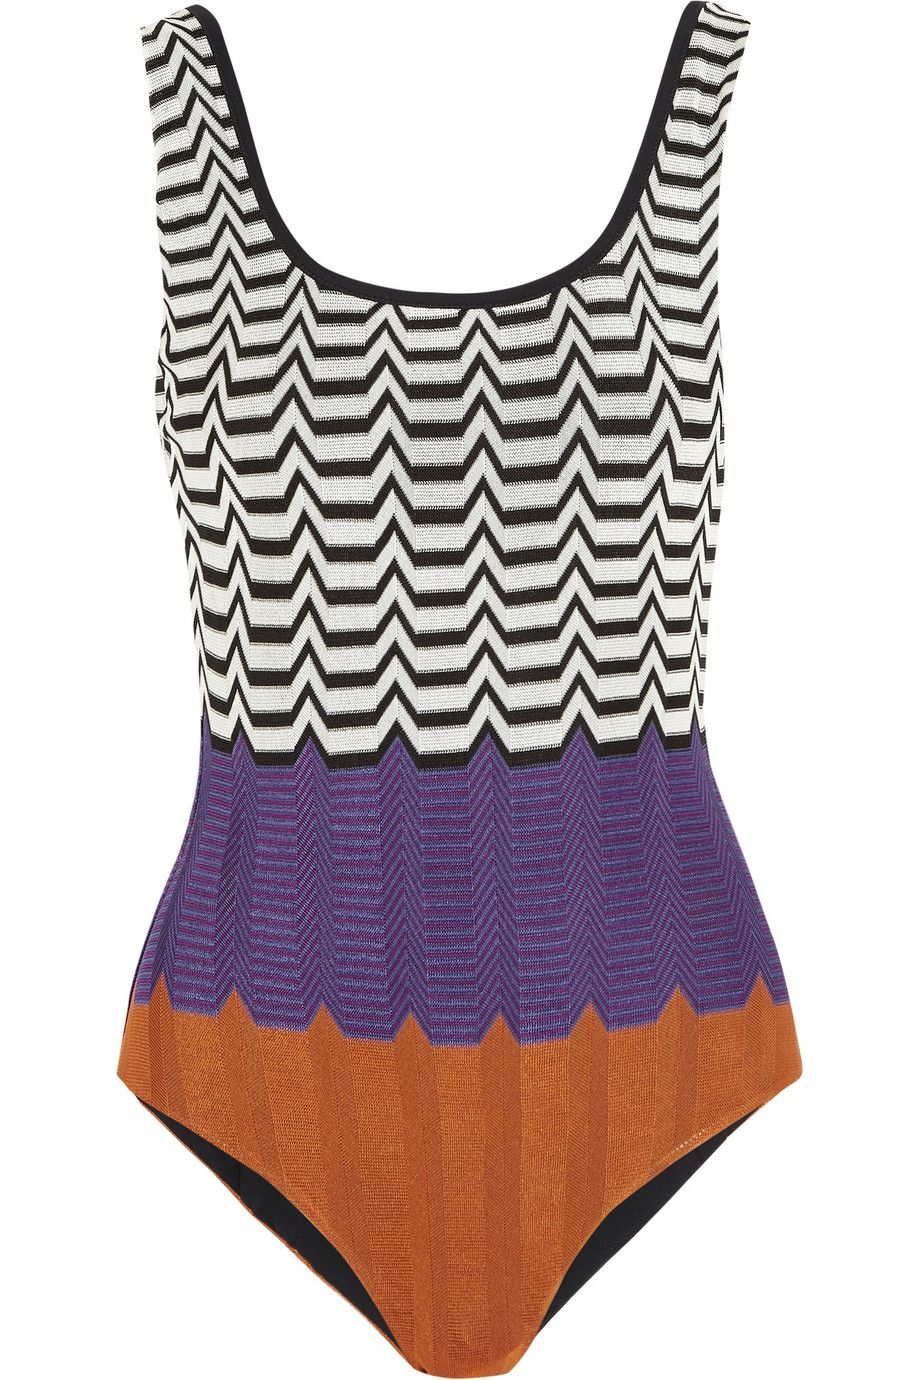 d6d83a46903 Missoni | Crochet-knit swimsuit | NET-A-PORTER.COM | My style ...